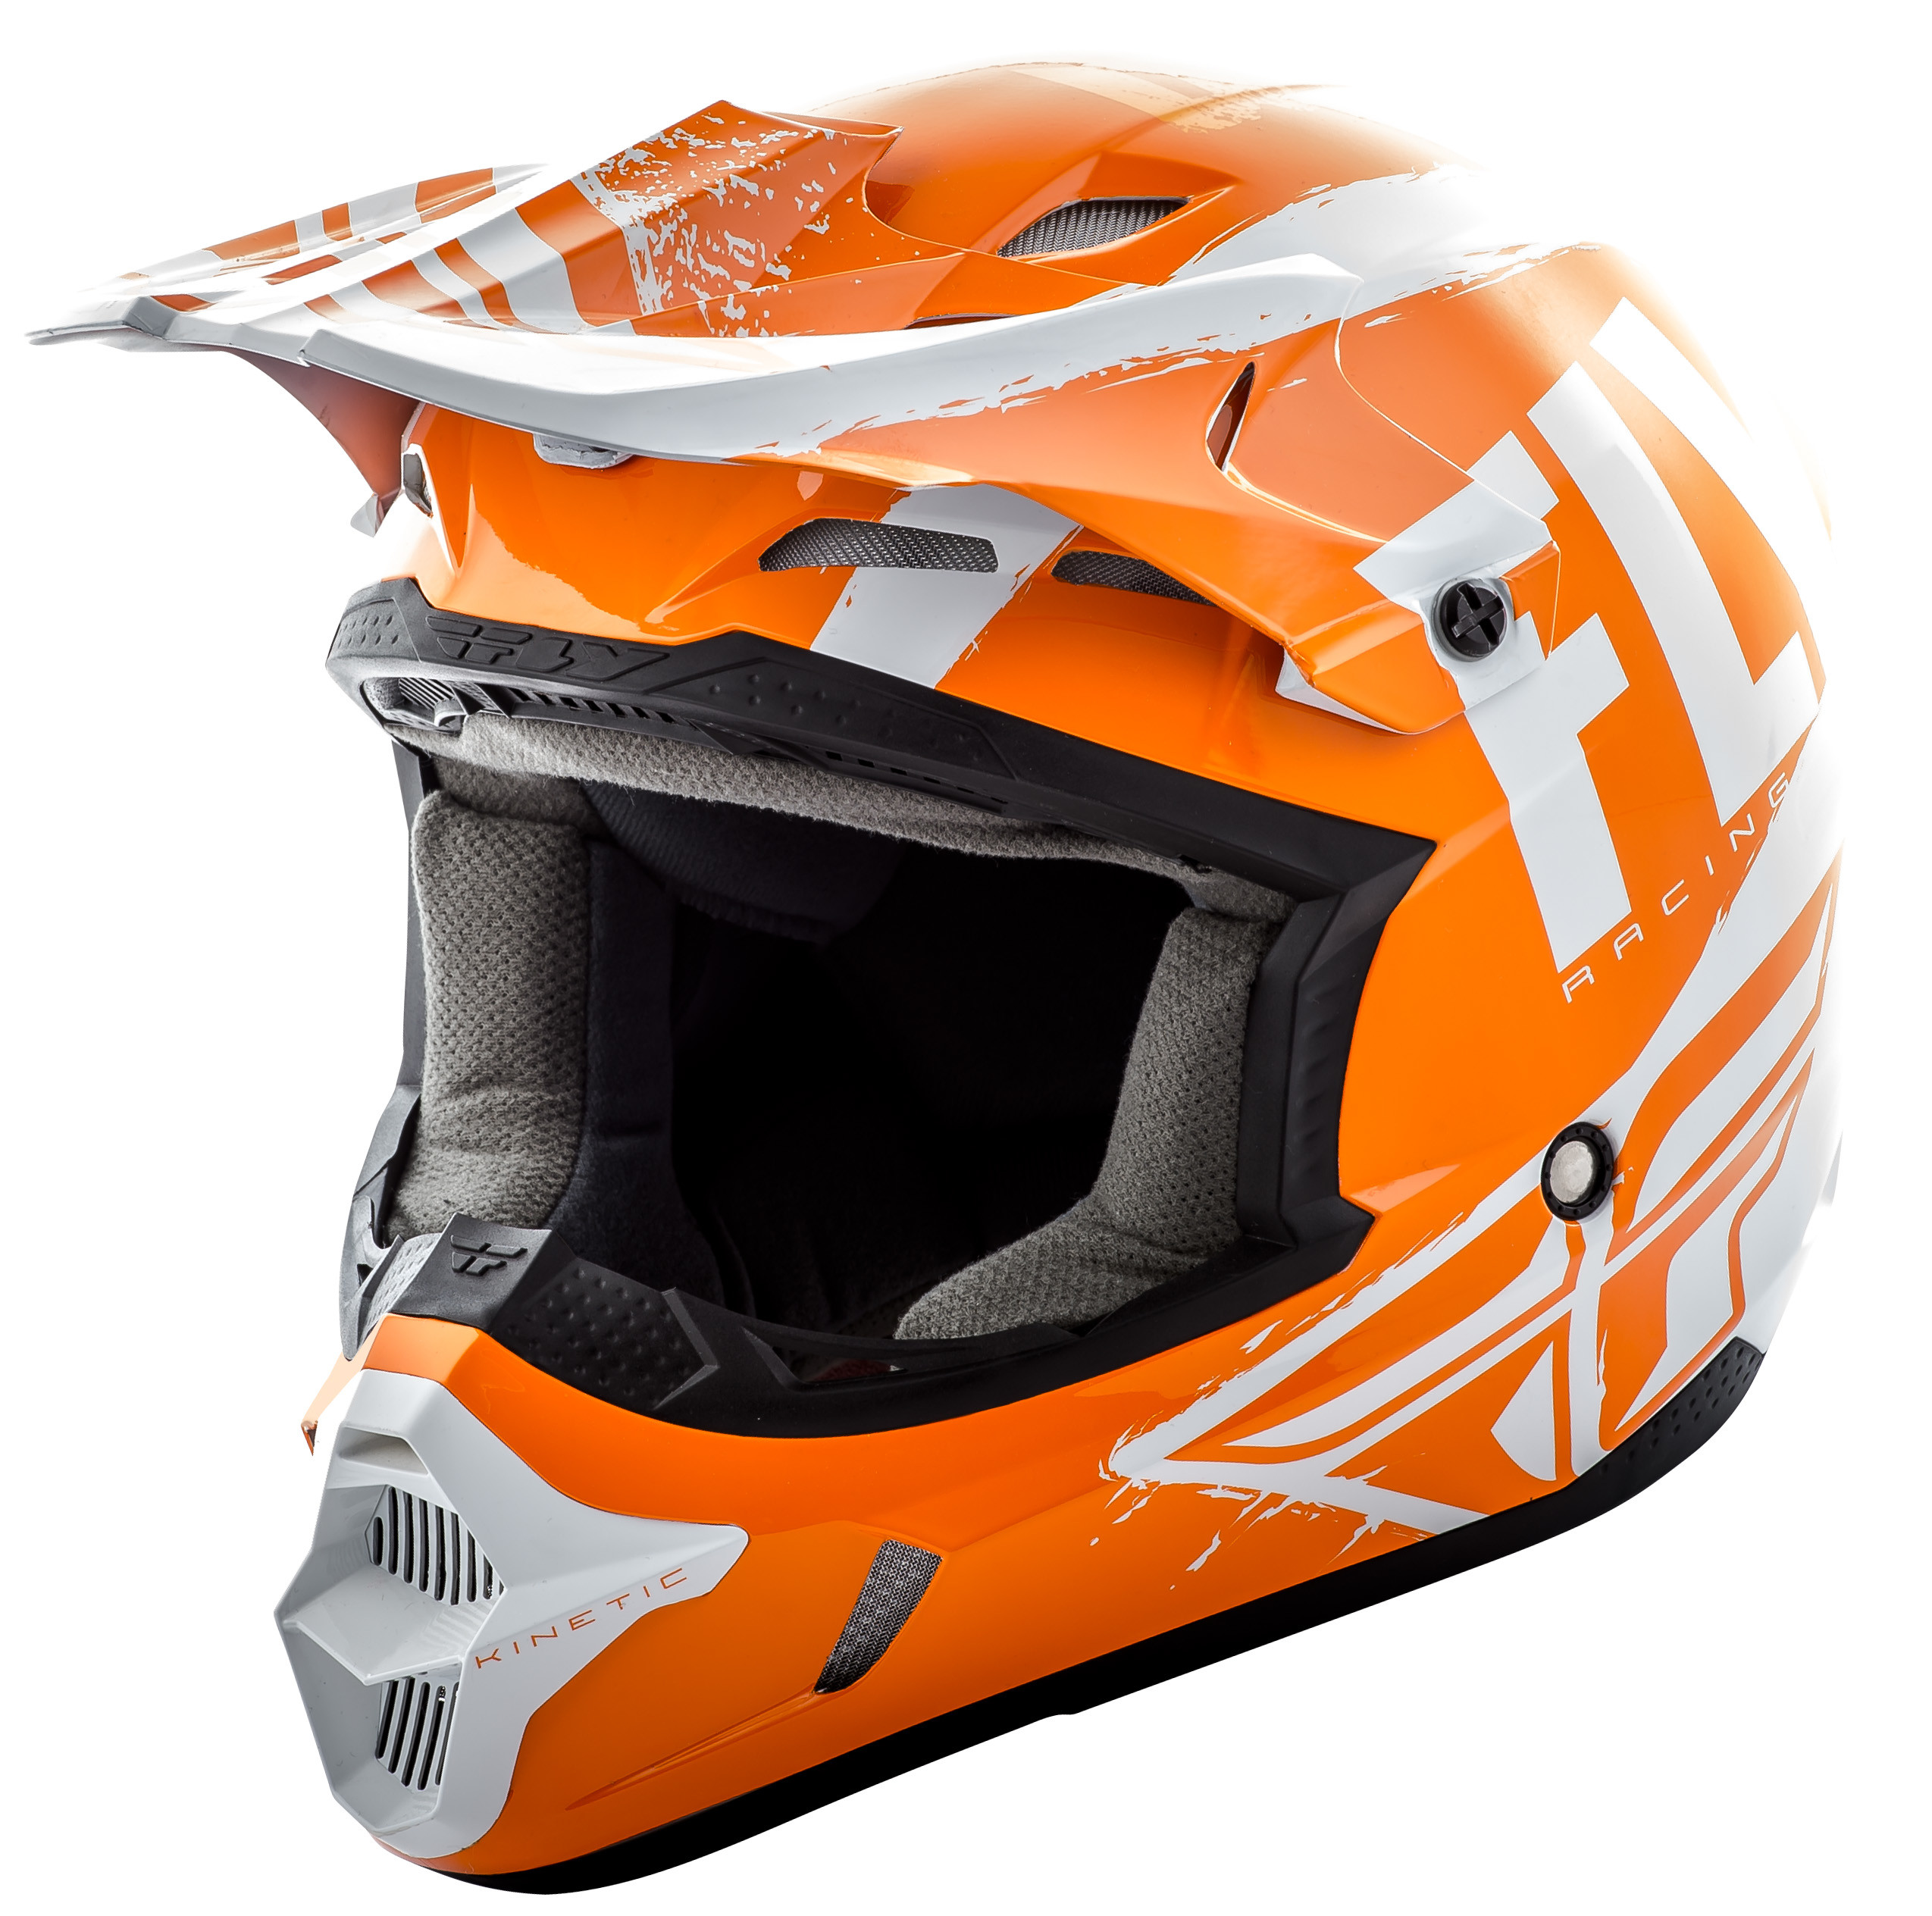 Kinetic Burnish Helmet Orange/White/Grey 2X